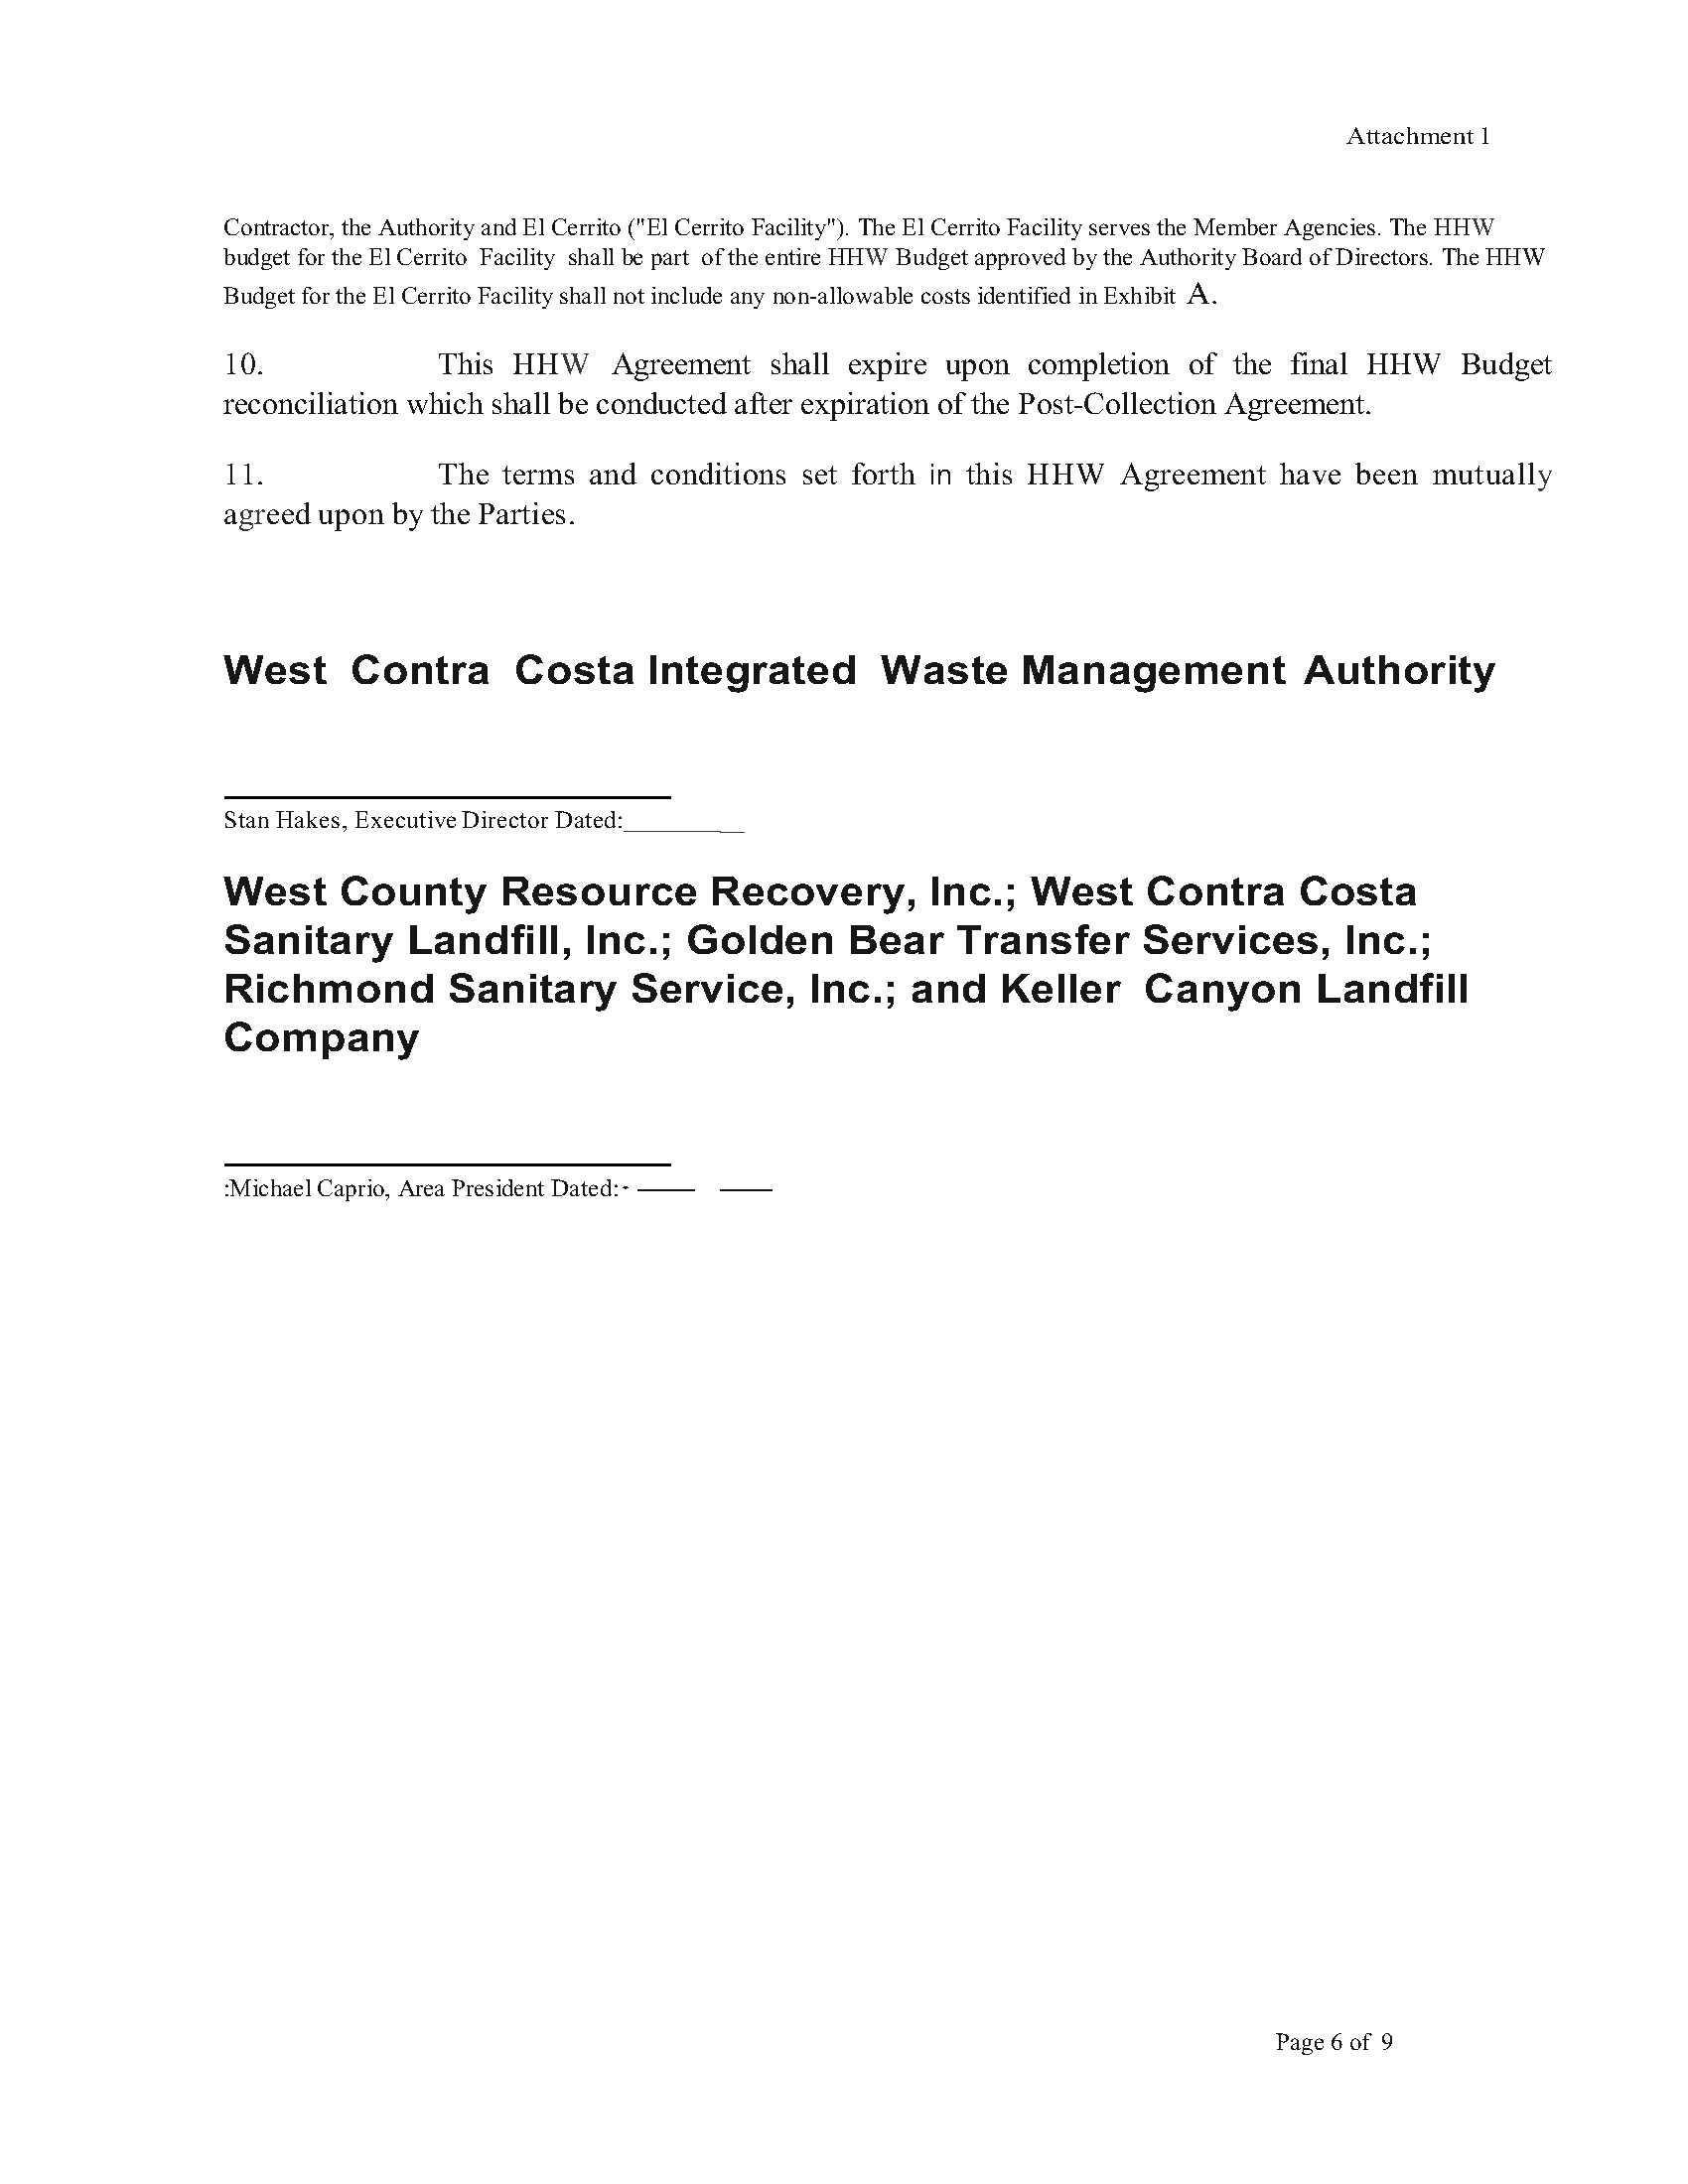 ESMAC Agenda 1.9.2019 (34 Pages)_28.jpg